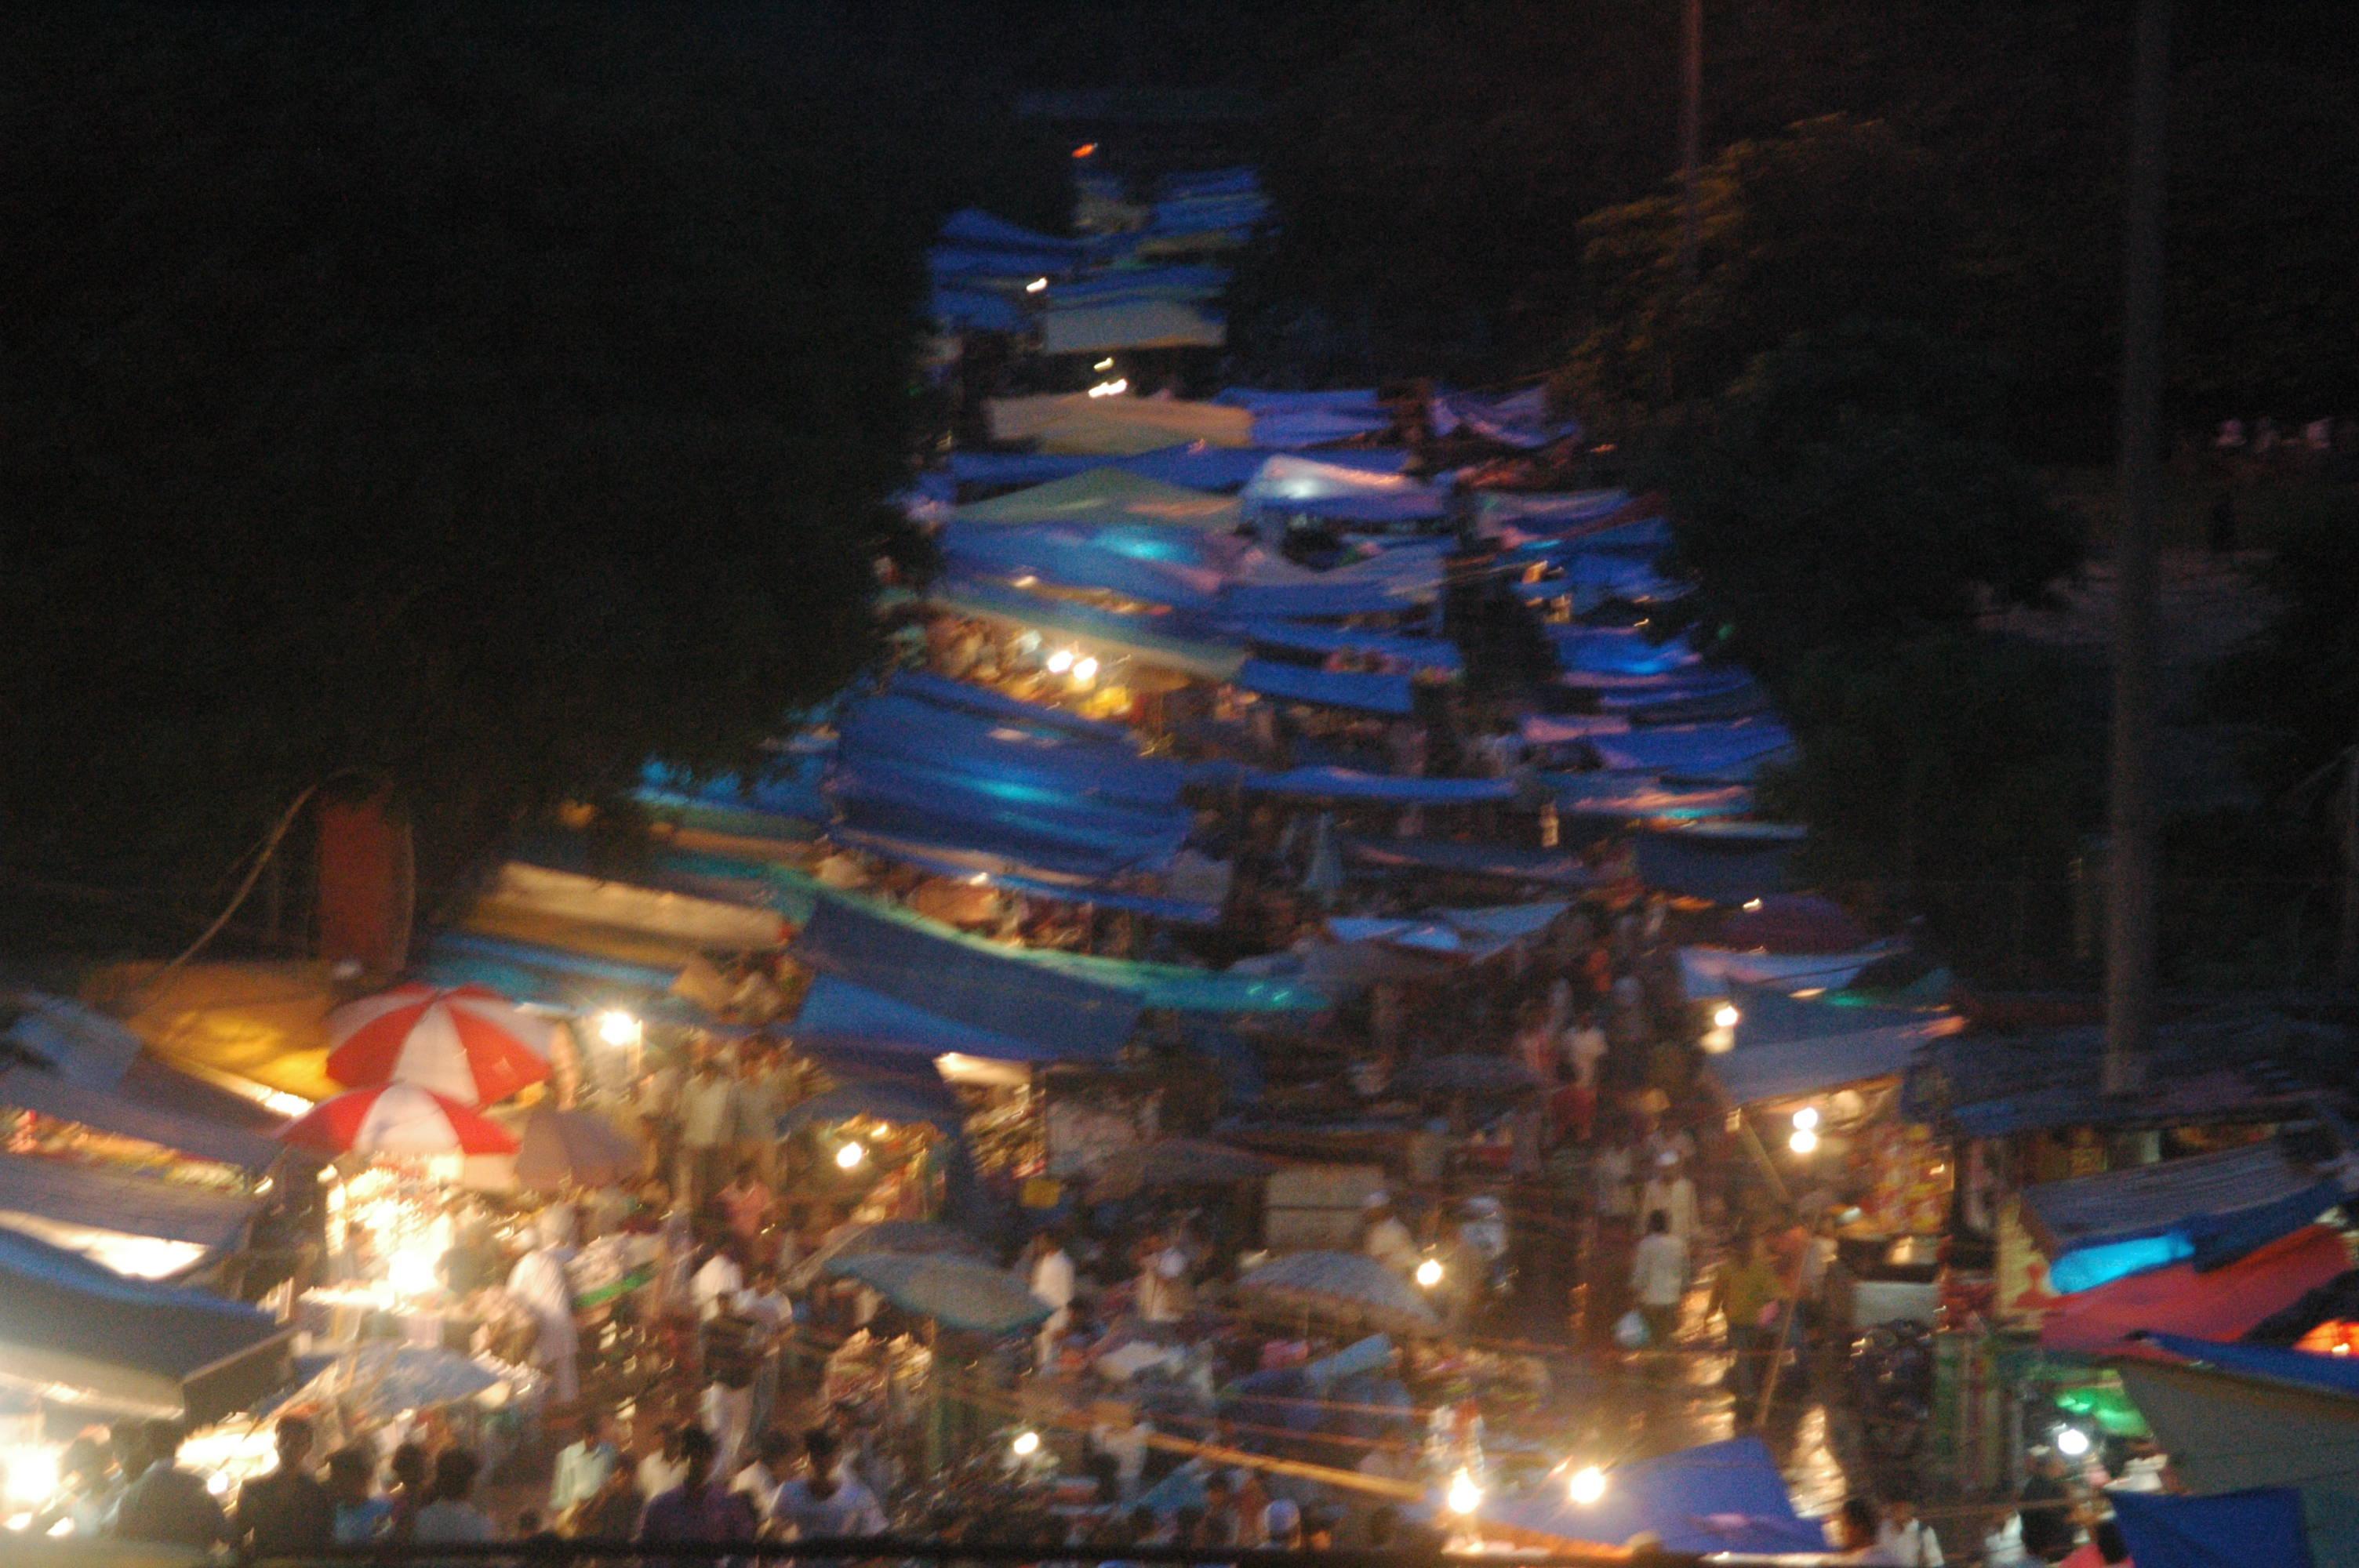 Meena Bazaar looks the busiest from Jama masjid; people thronging to grab something before entering the masjid